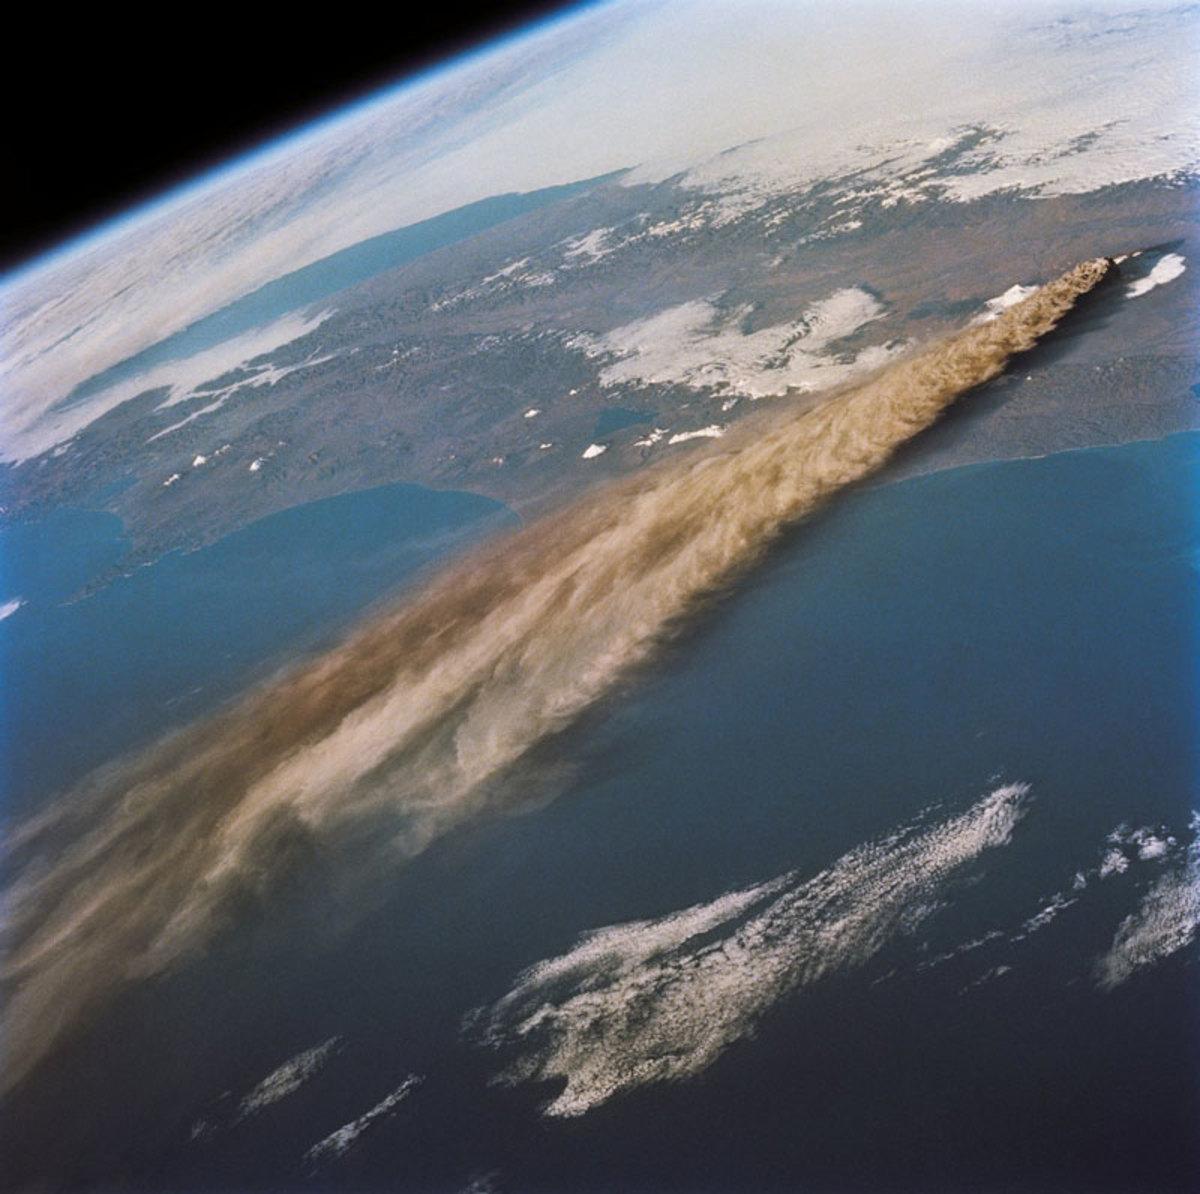 kliuchevskoi-volcano-kamchatika-russia-from-space-aerial-nasa